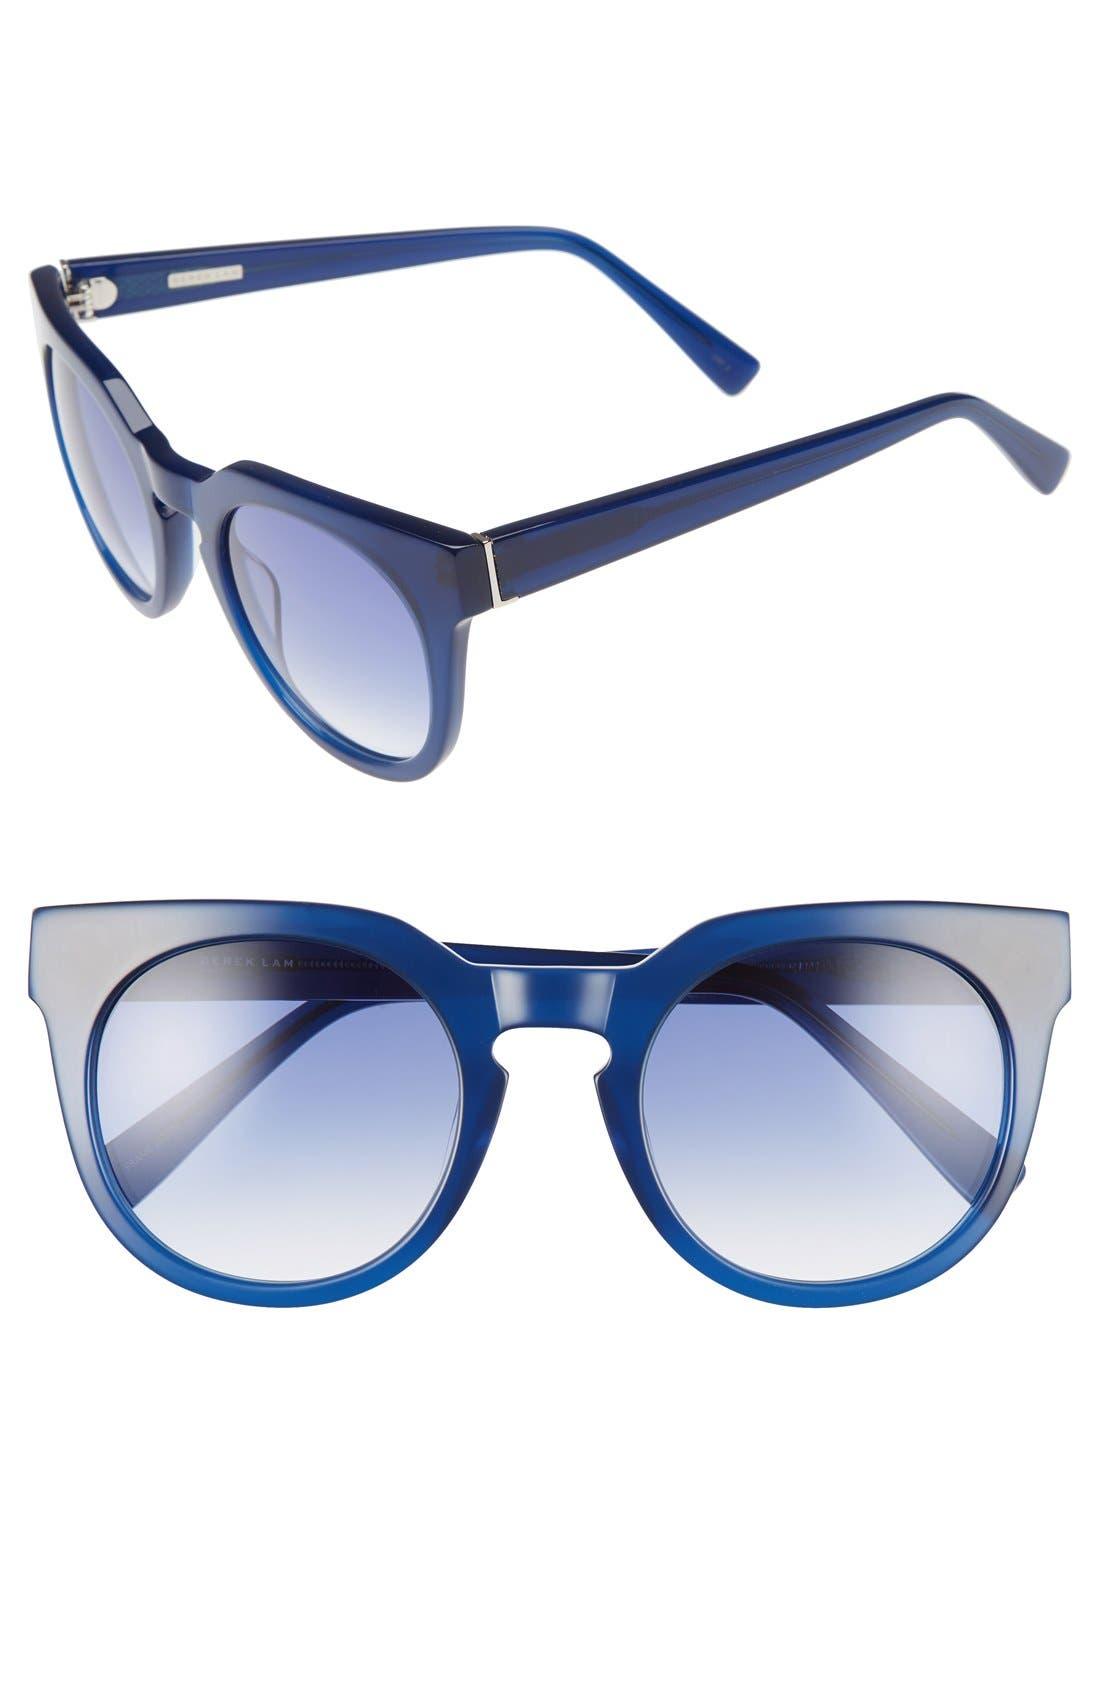 Alternate Image 1 Selected - Derek Lam 'Stella' 51mm Round Sunglasses